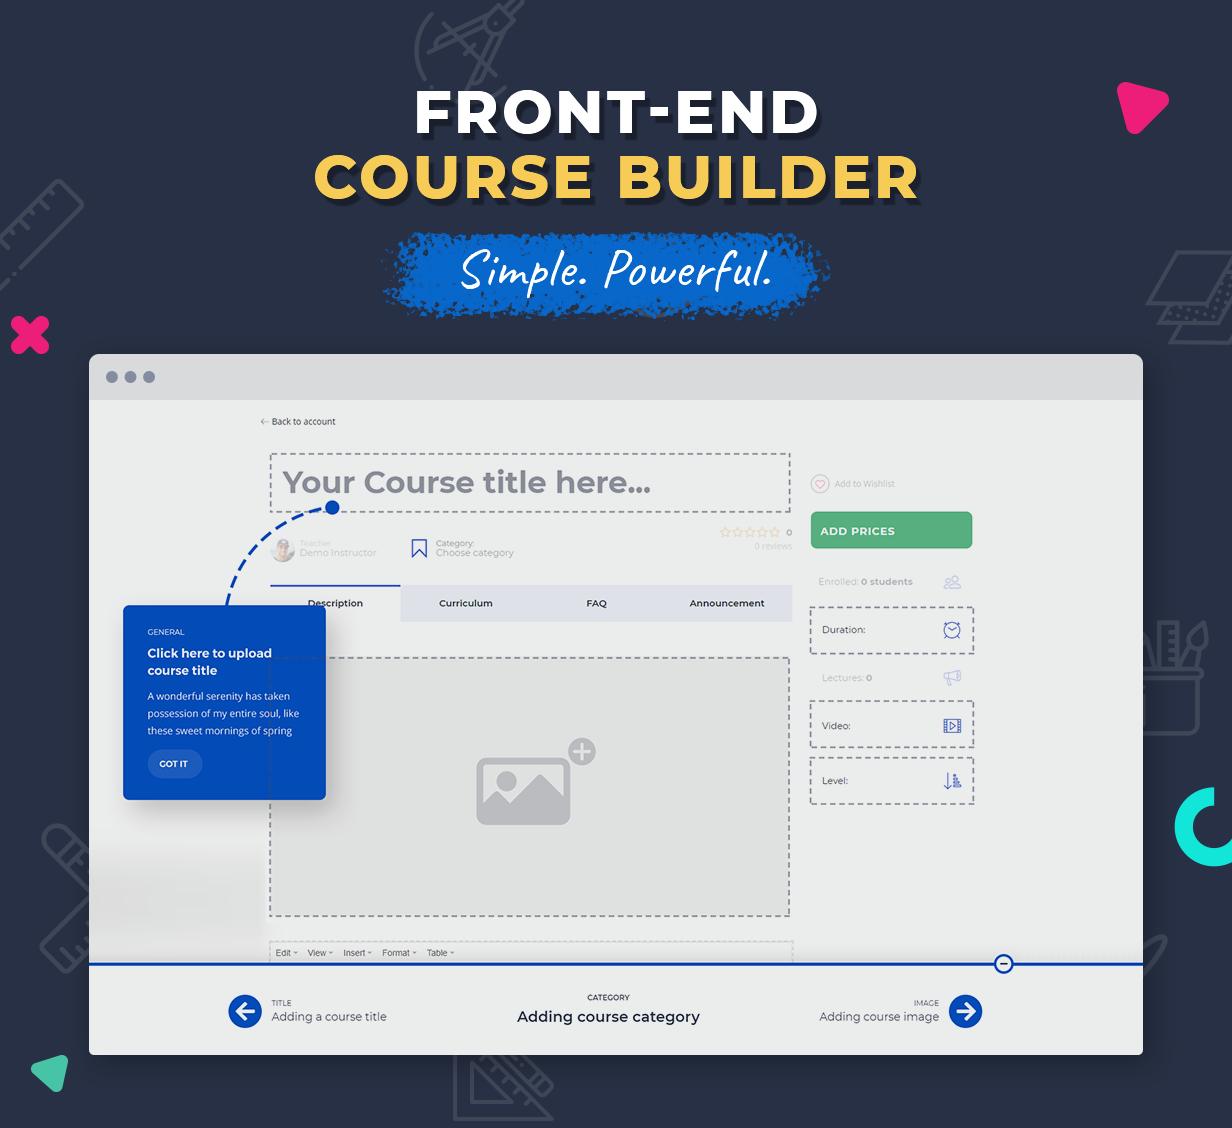 front-end course builder